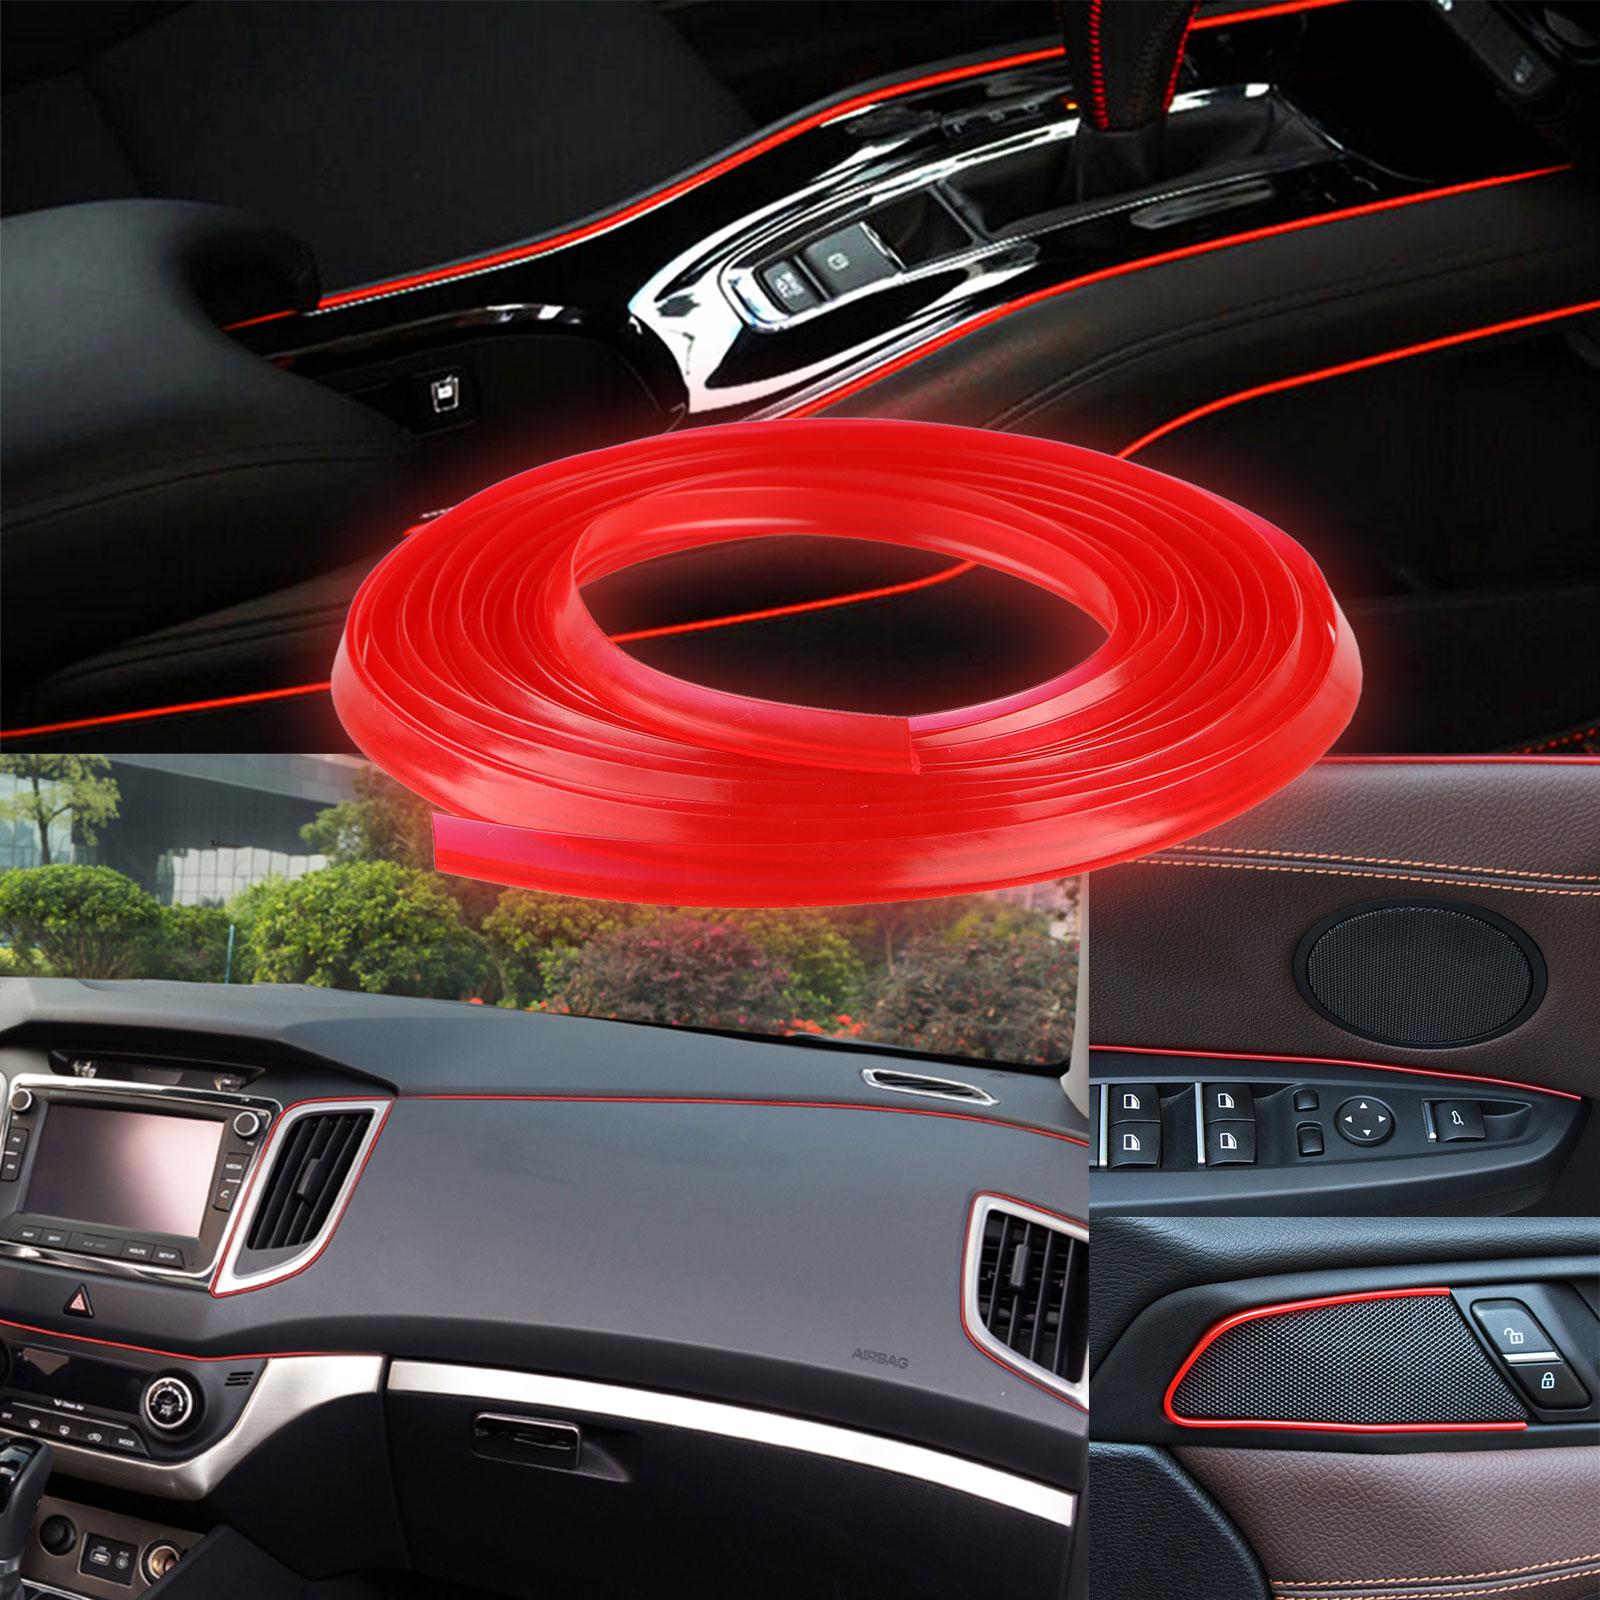 Car Parts - 5M Door Gap Trim Molding Moulding Line Edge Strip Red For Car Interior Accessory